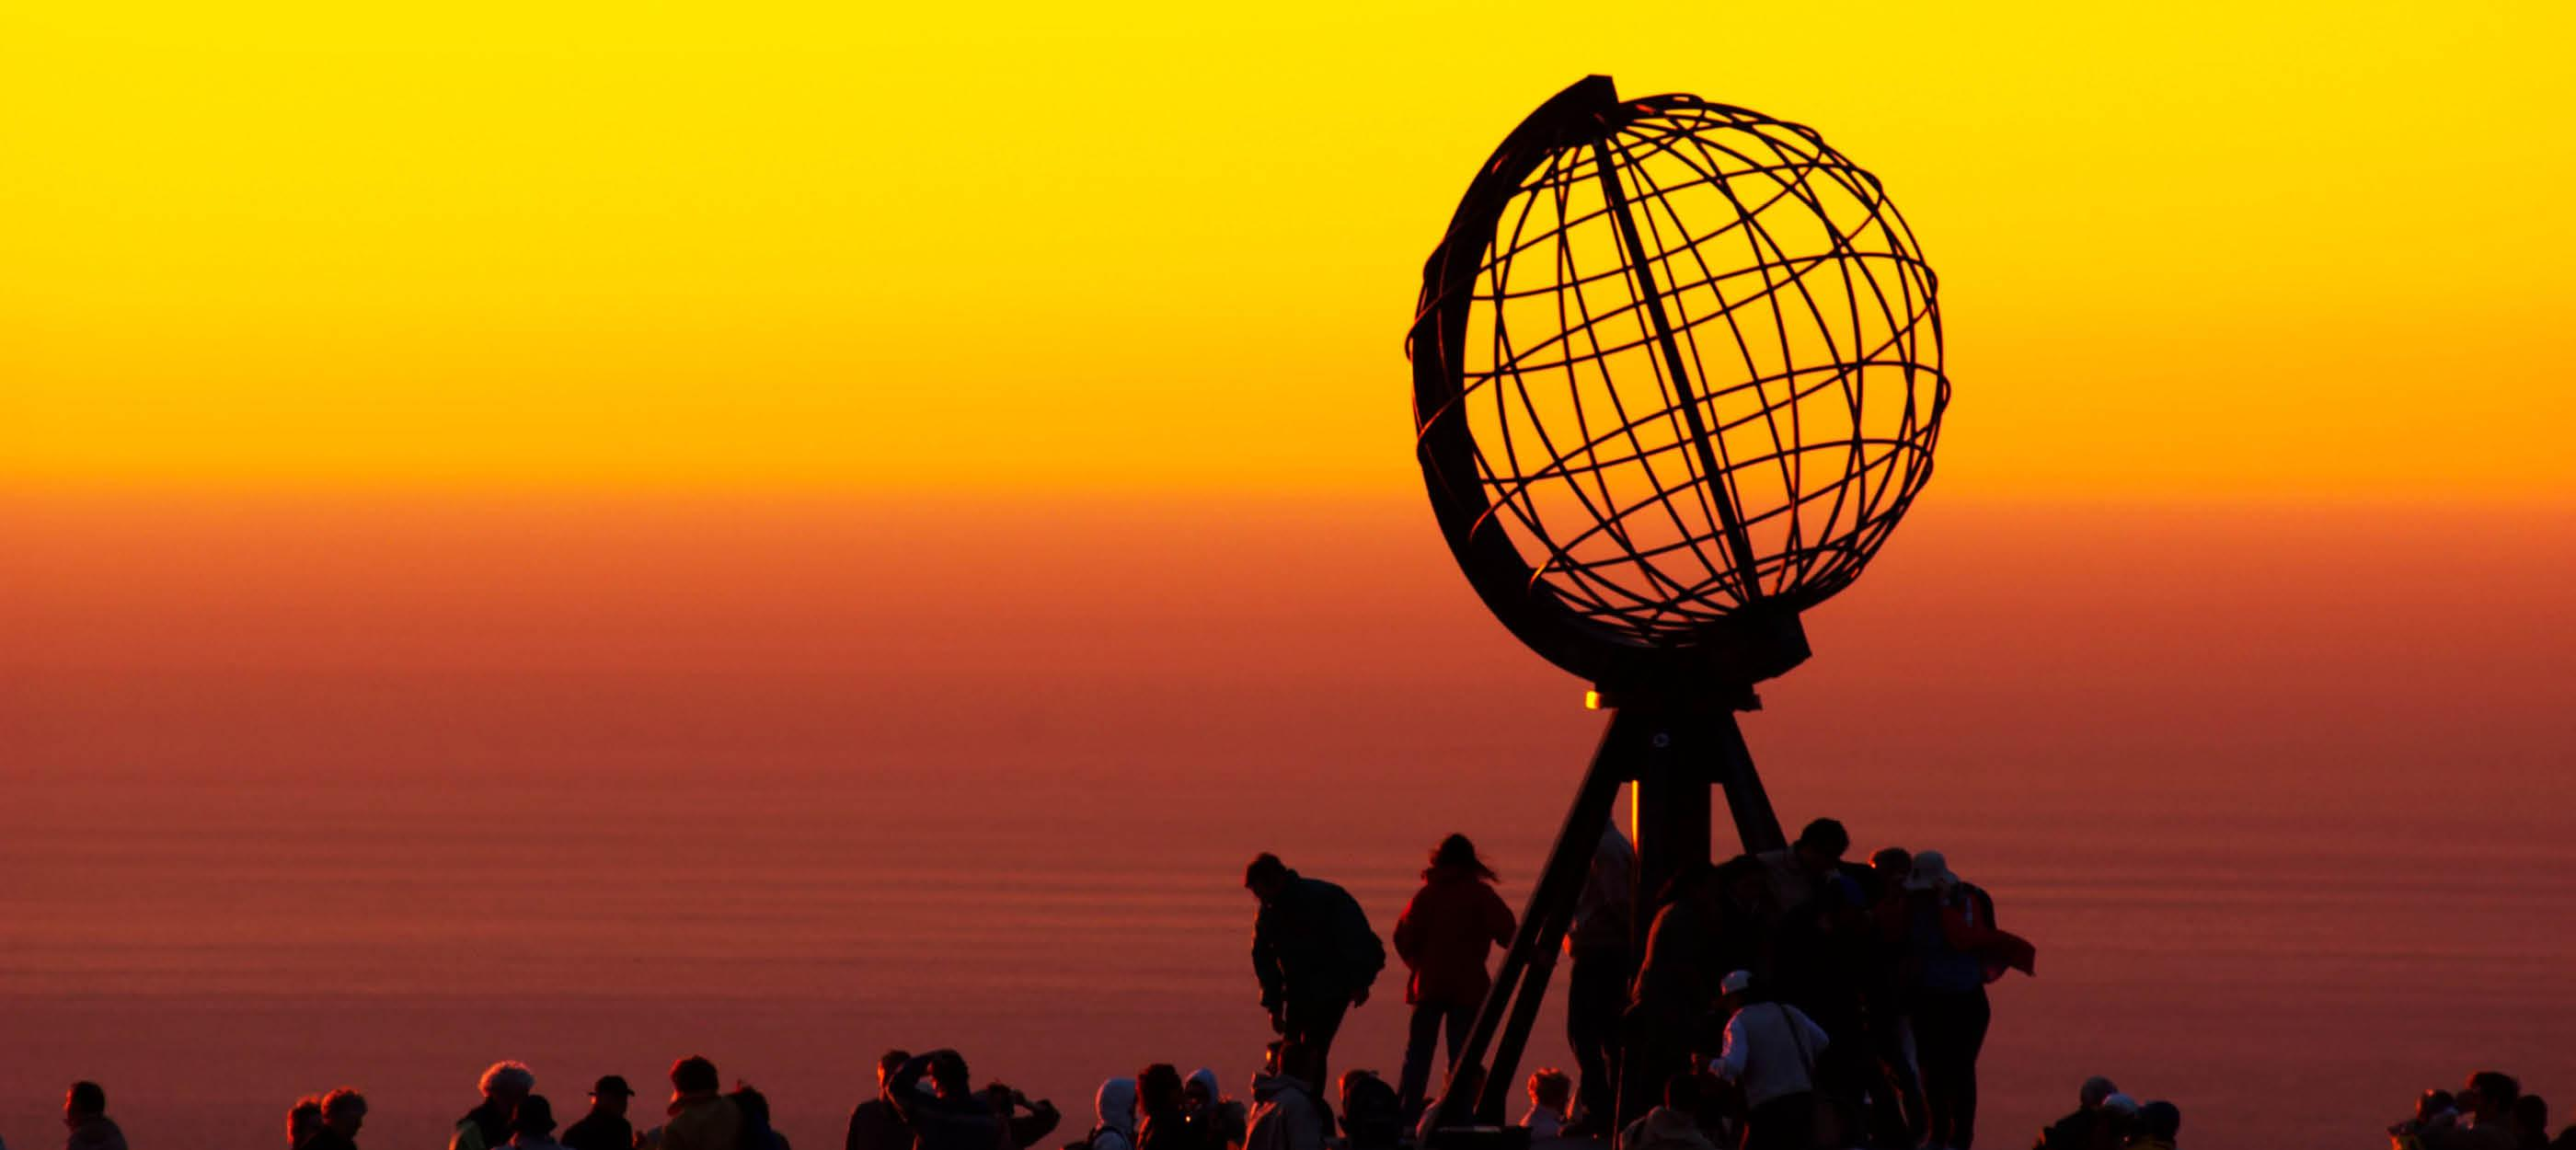 Den ikoniske globus, Nordkap